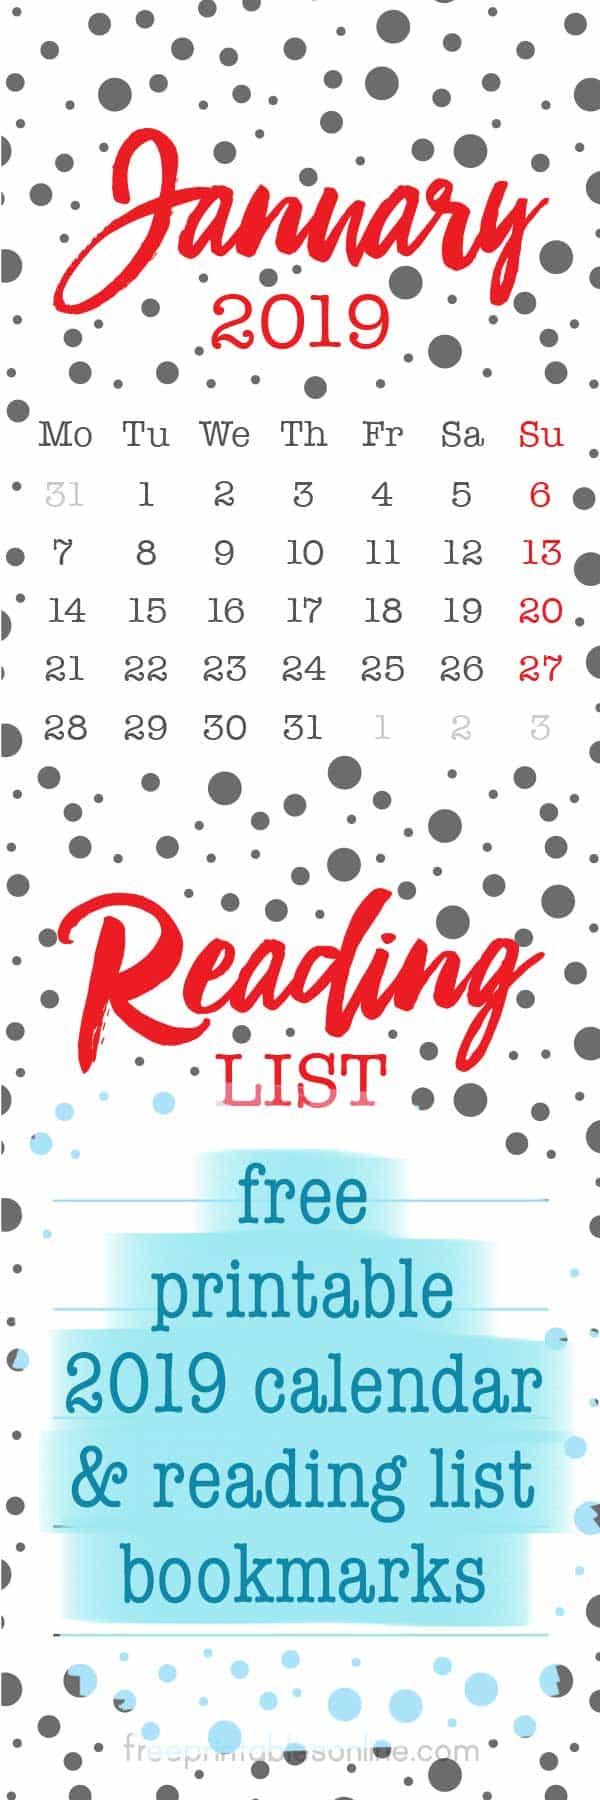 2019 calendar bookmarks